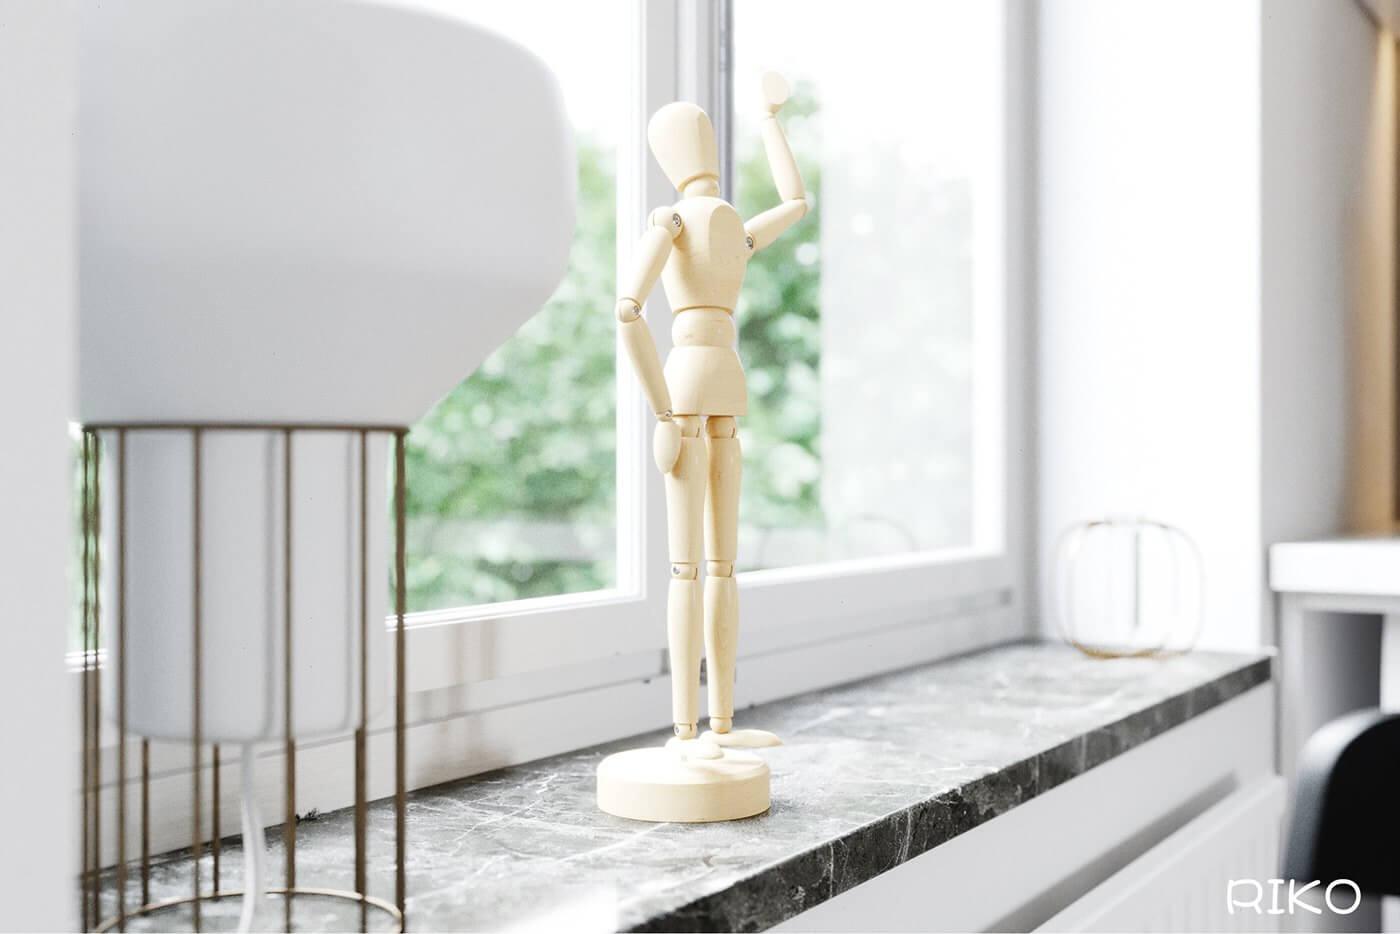 White kitchen design accessoires wood sculpture - cgi visualization